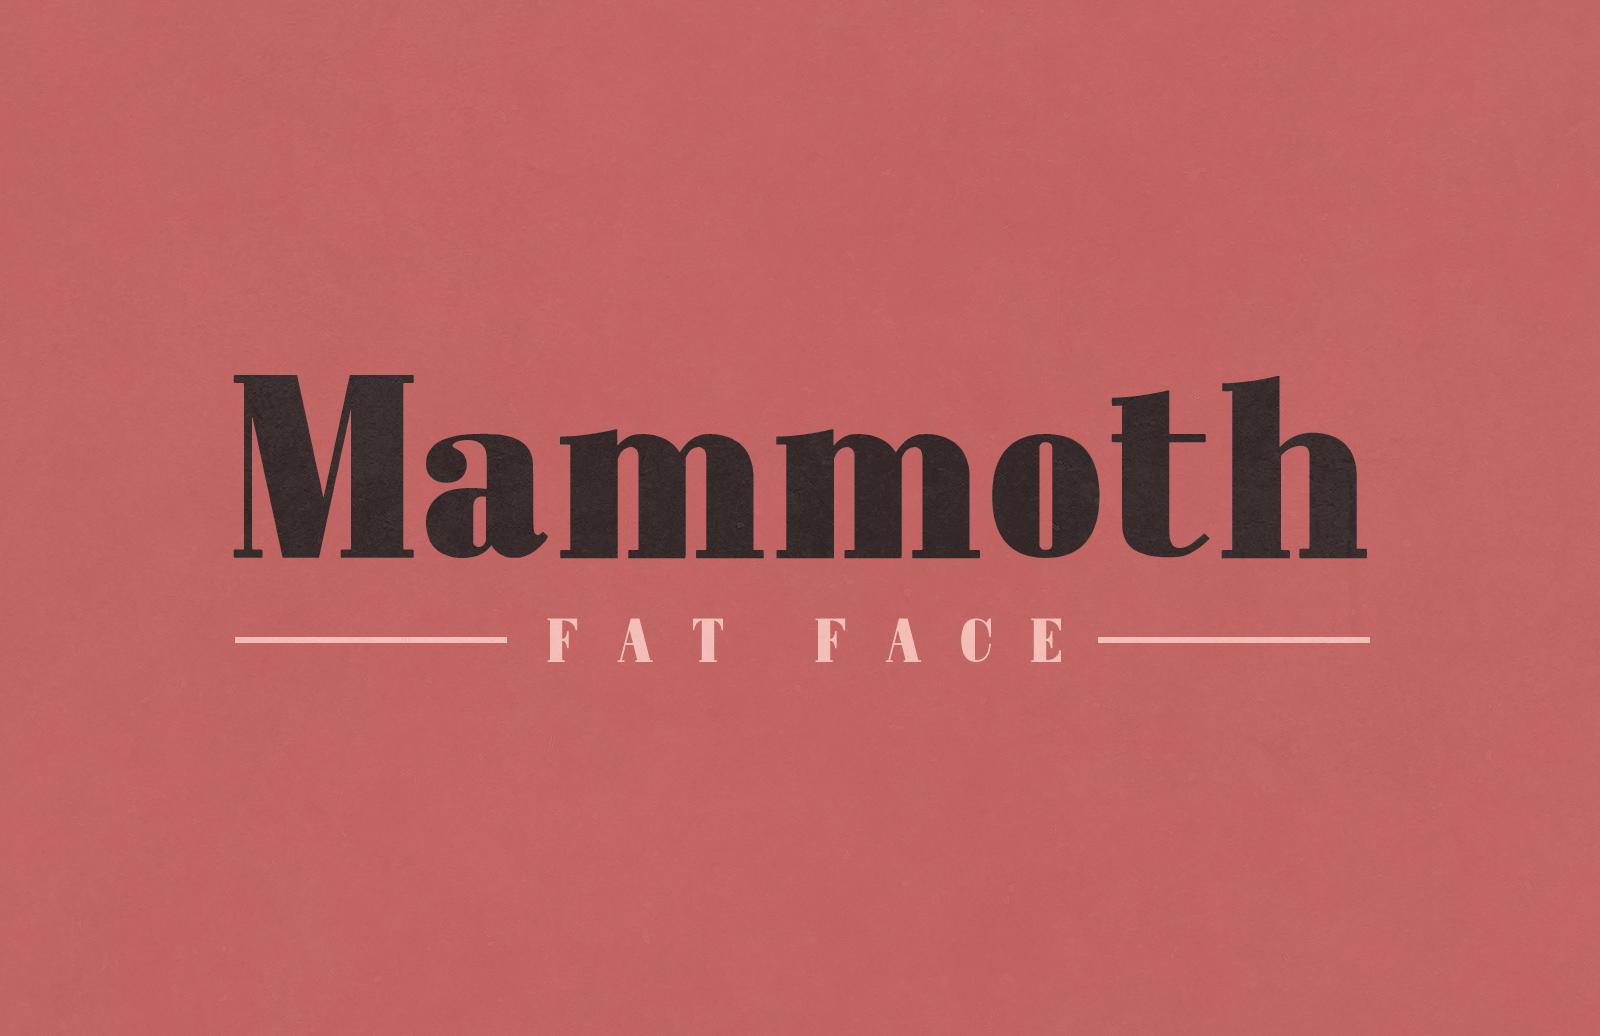 Mammoth Fat Face - Letterpress Font 1